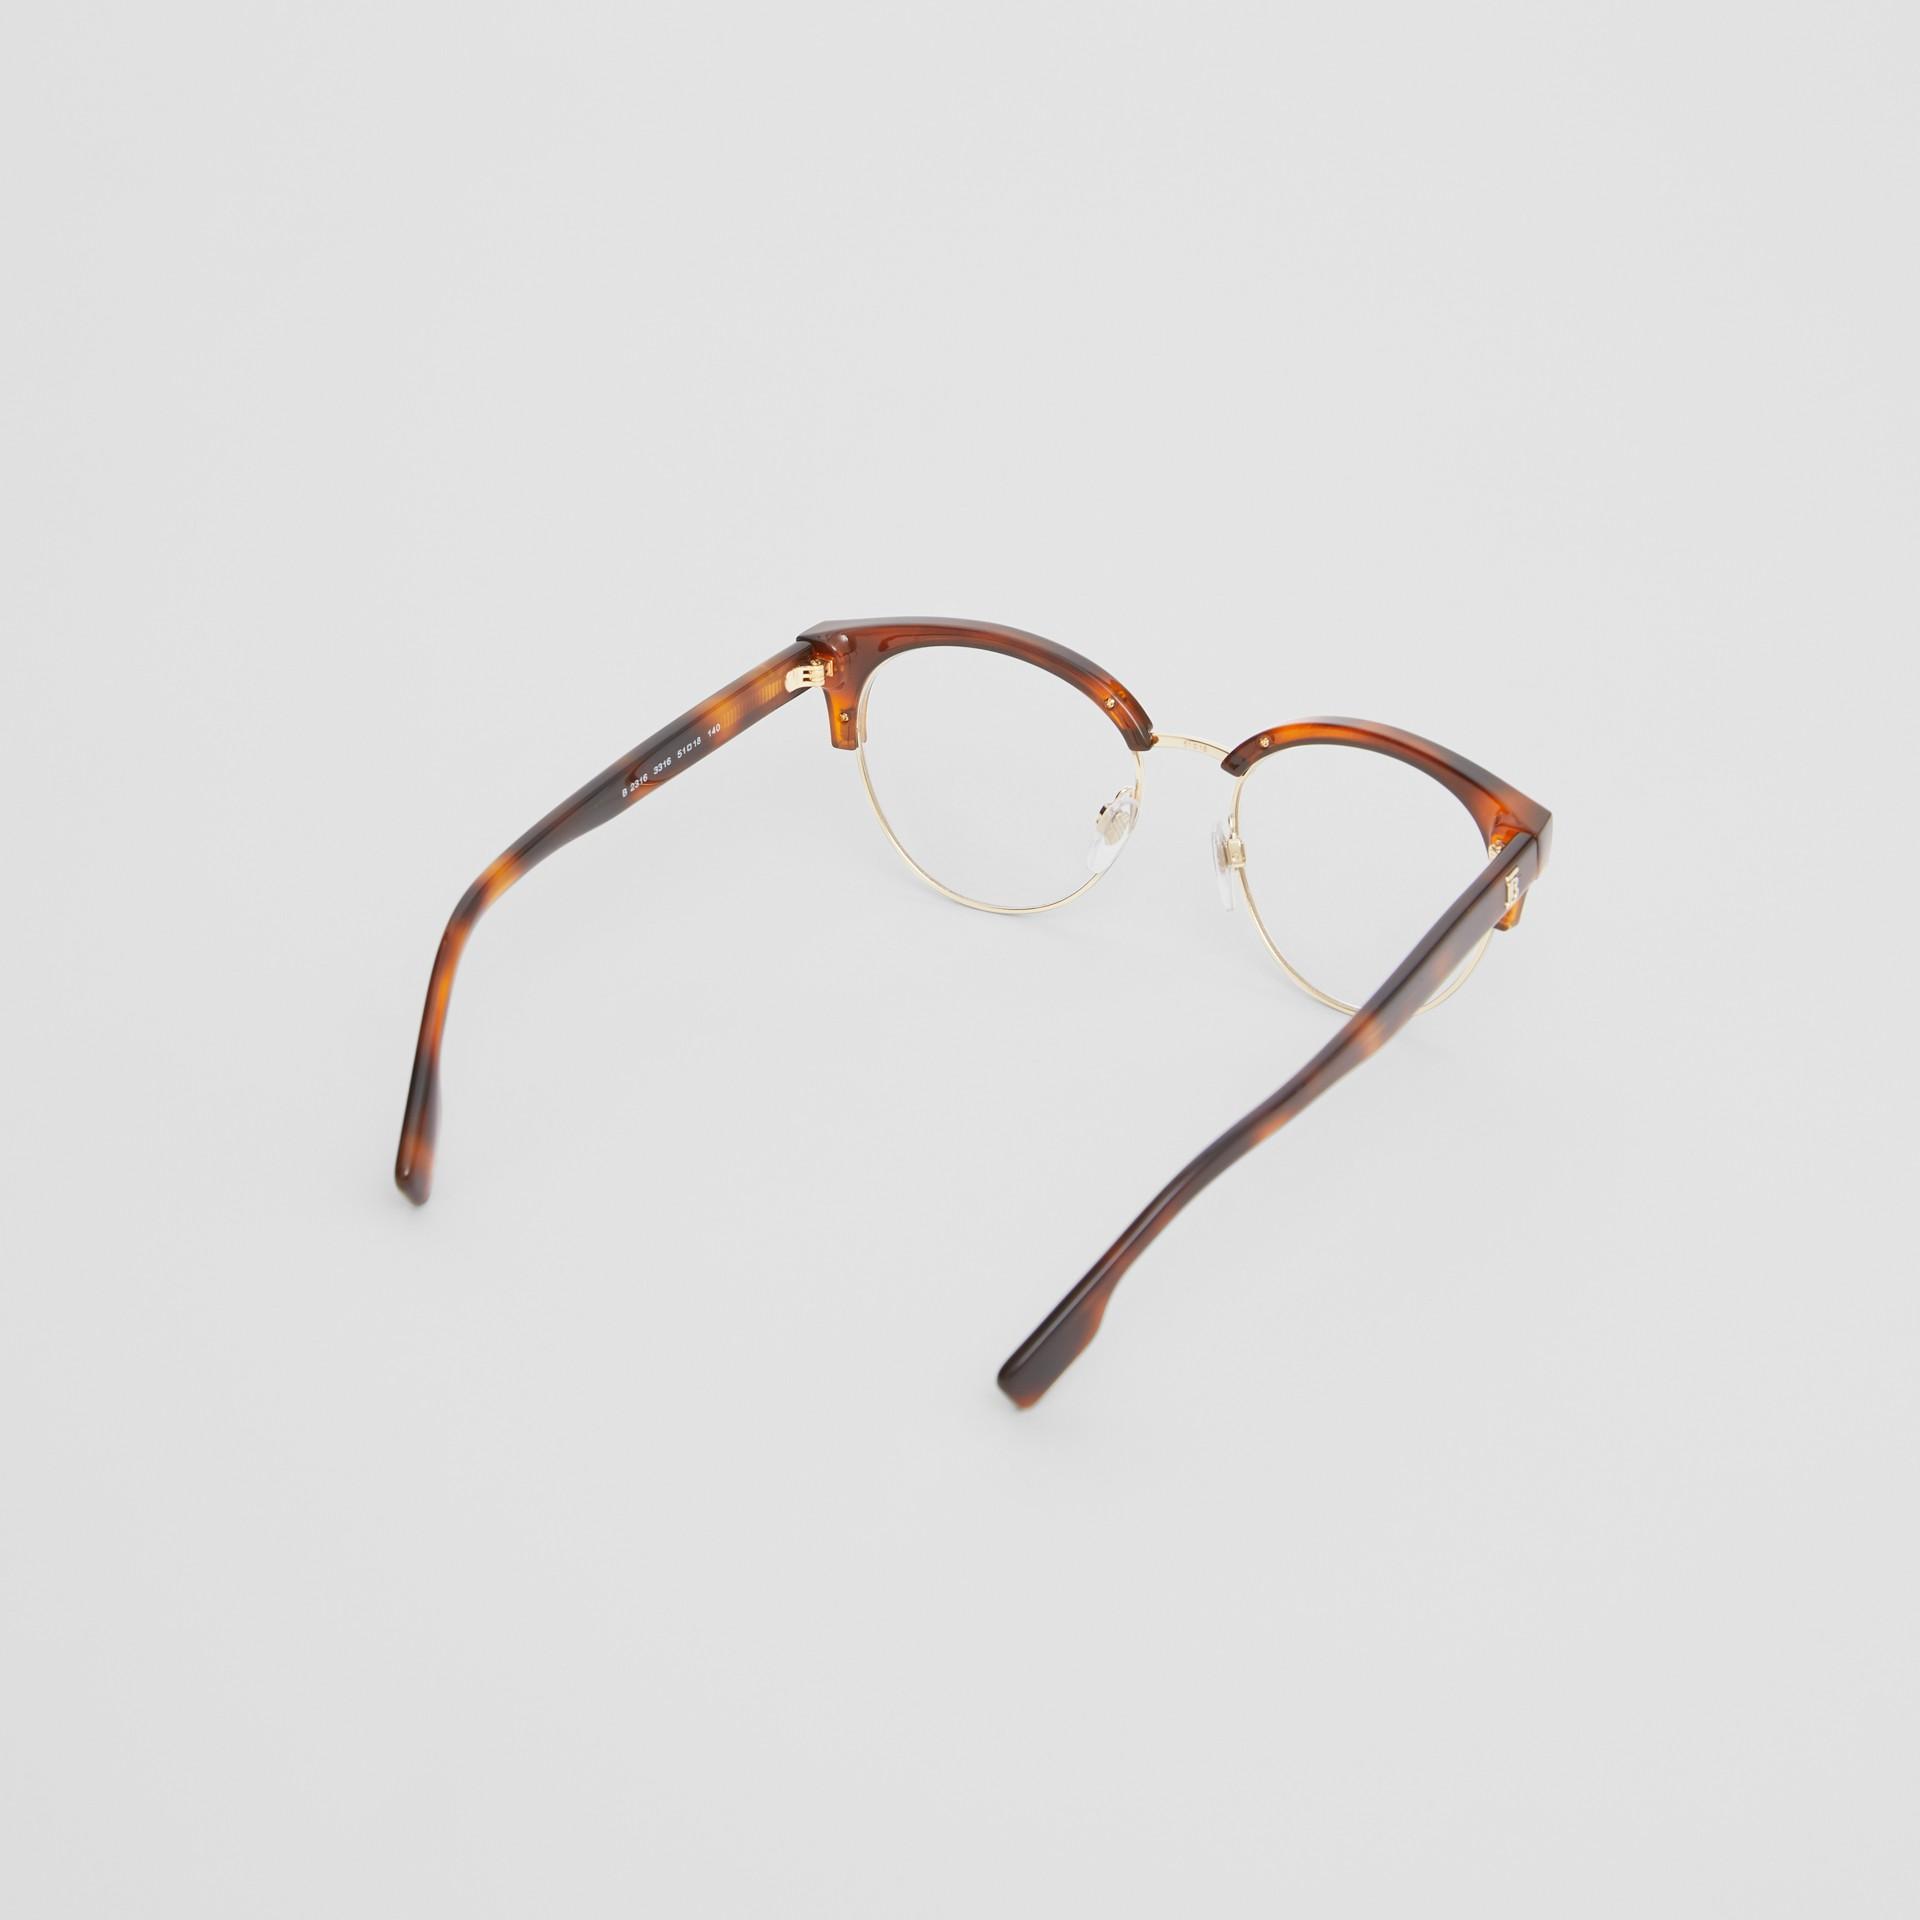 Cat-eye Optical Frames in Tortoise Amber - Women | Burberry - gallery image 4